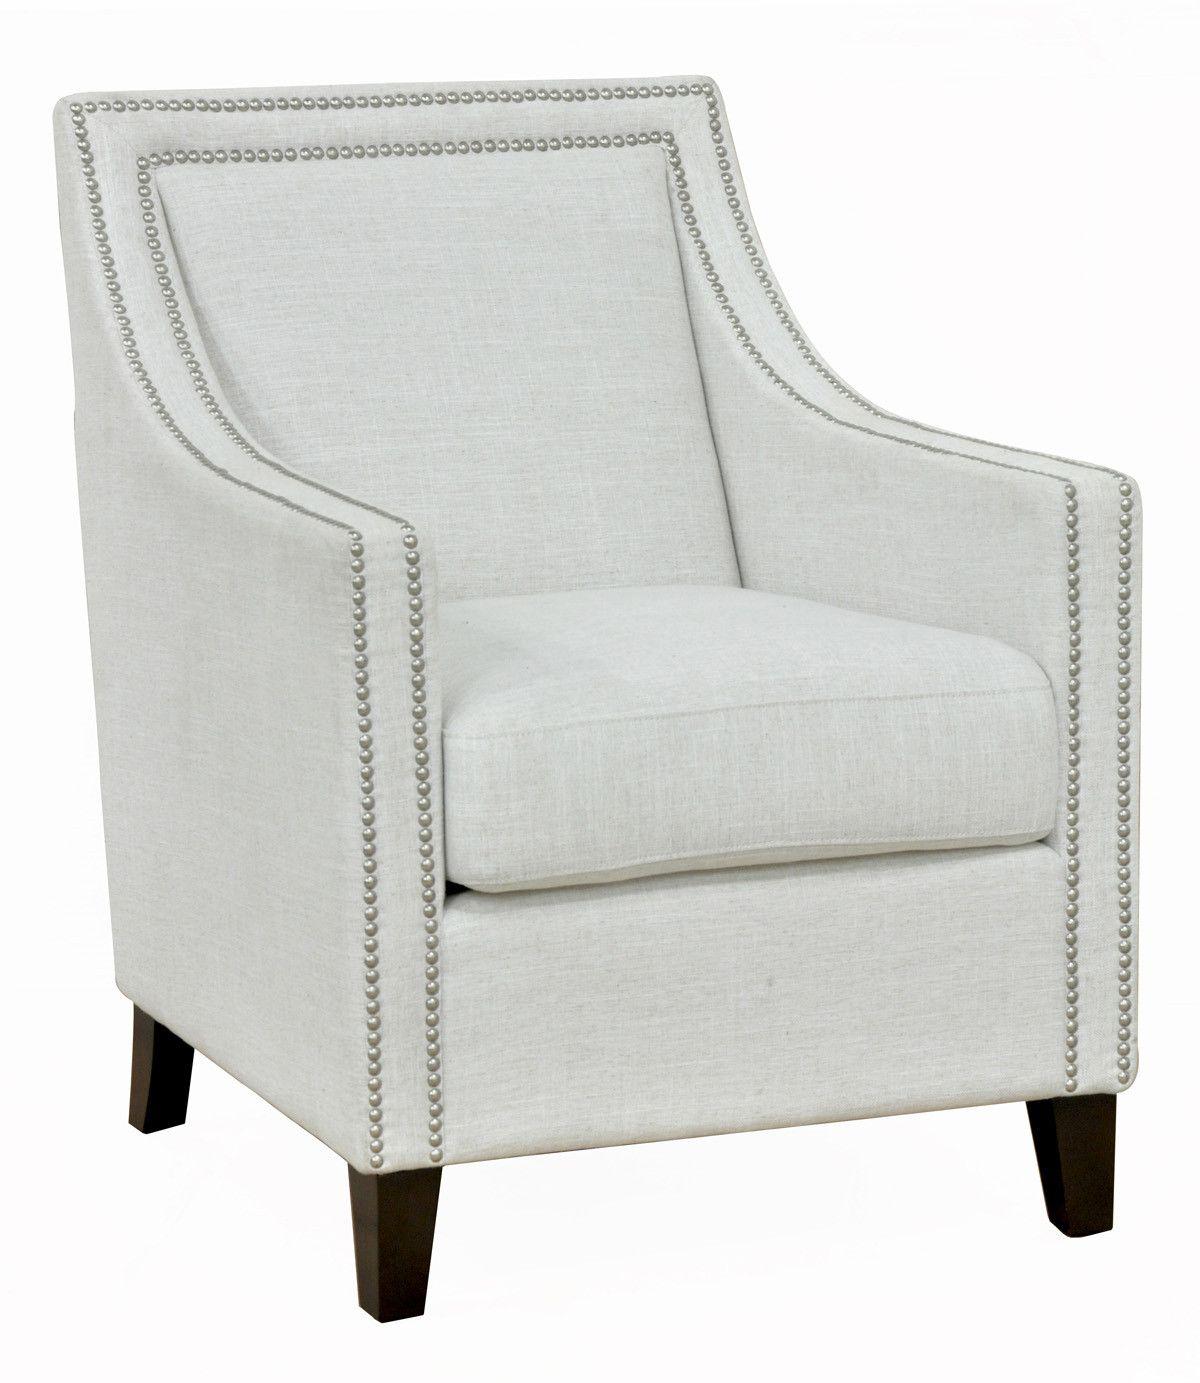 Collina Club Chair-Ivory